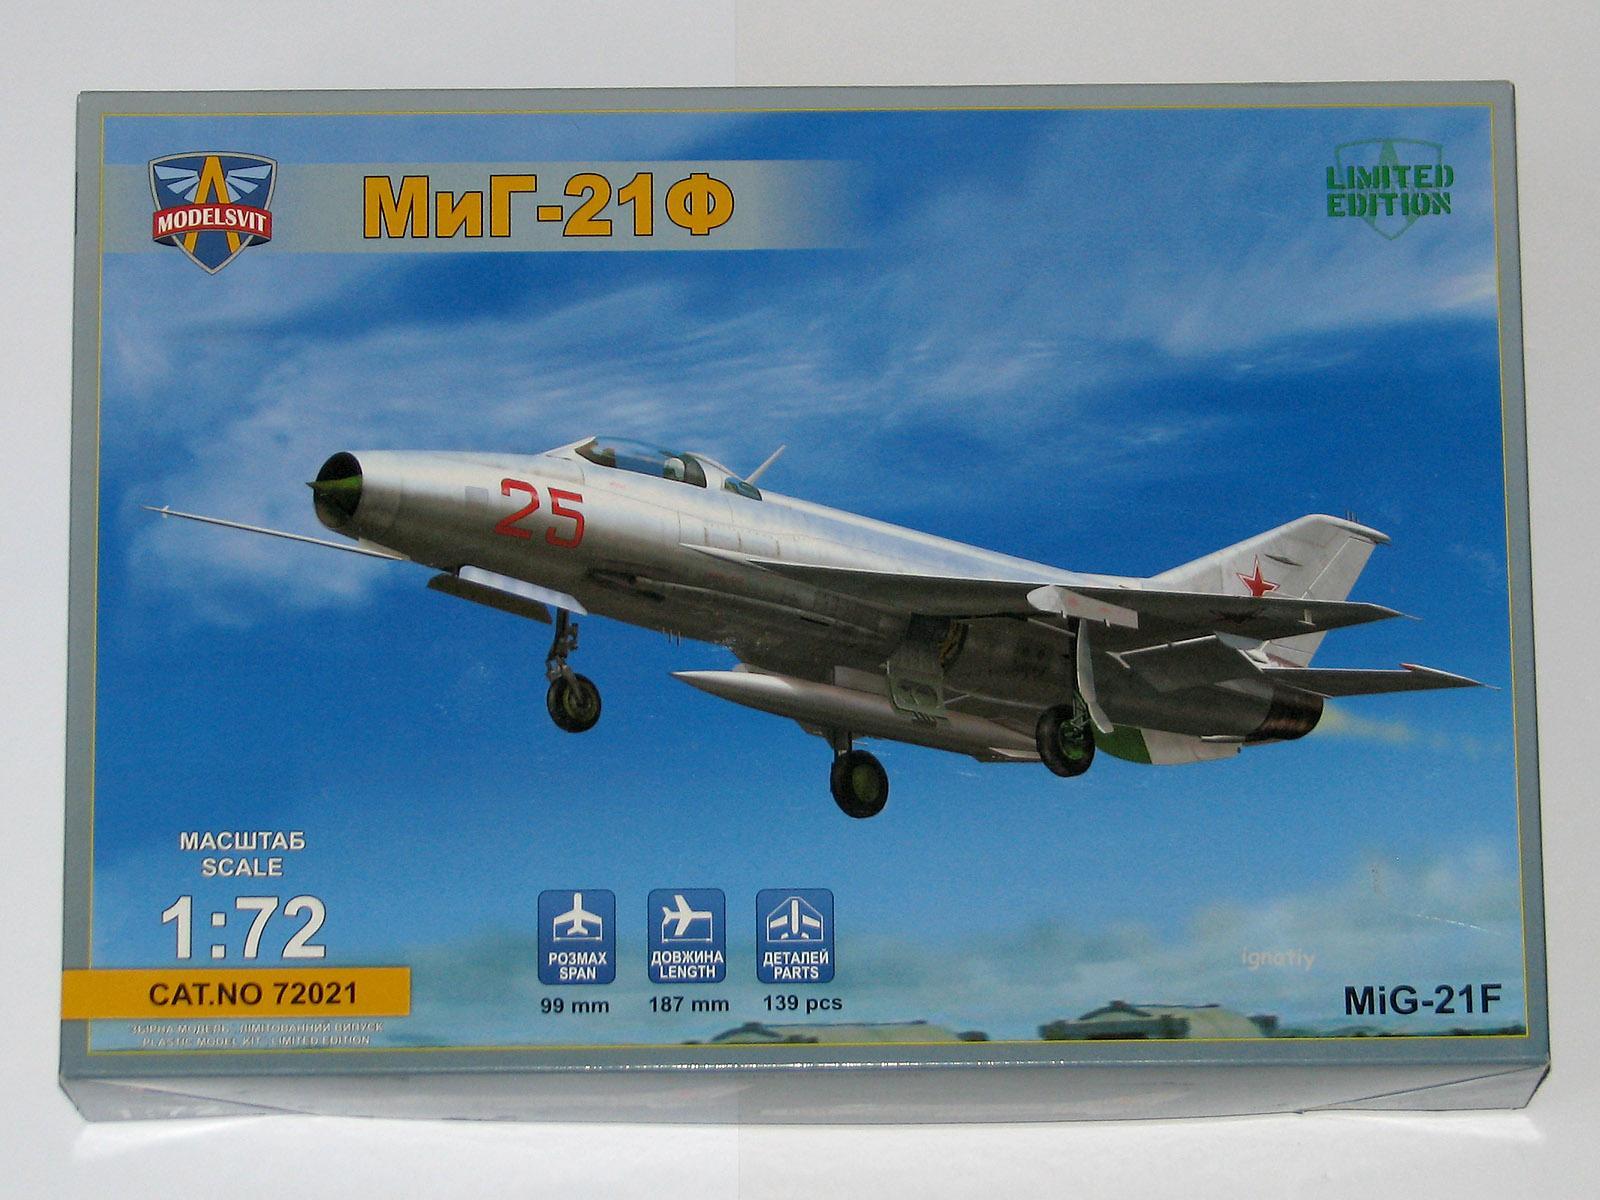 MiG-21F_01.jpg.7c202e48bbf452e6aa1b1b4b9